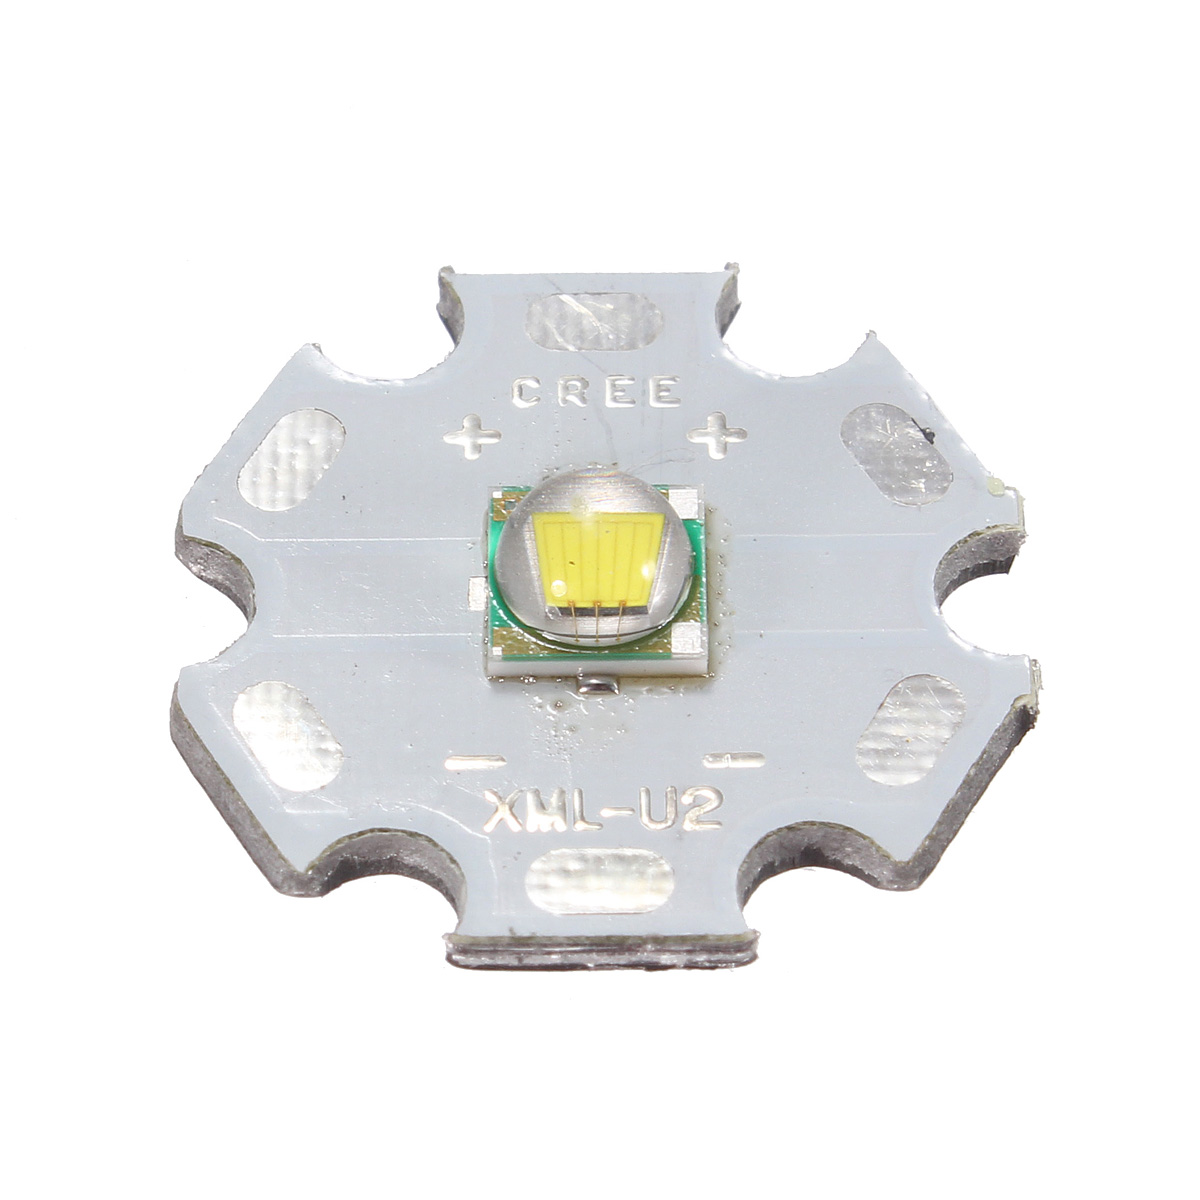 High quality 10W 20mm White 1100Lm XML U2 LED Emitter Light Lamp Star Base 3000mA DIY(China (Mainland))